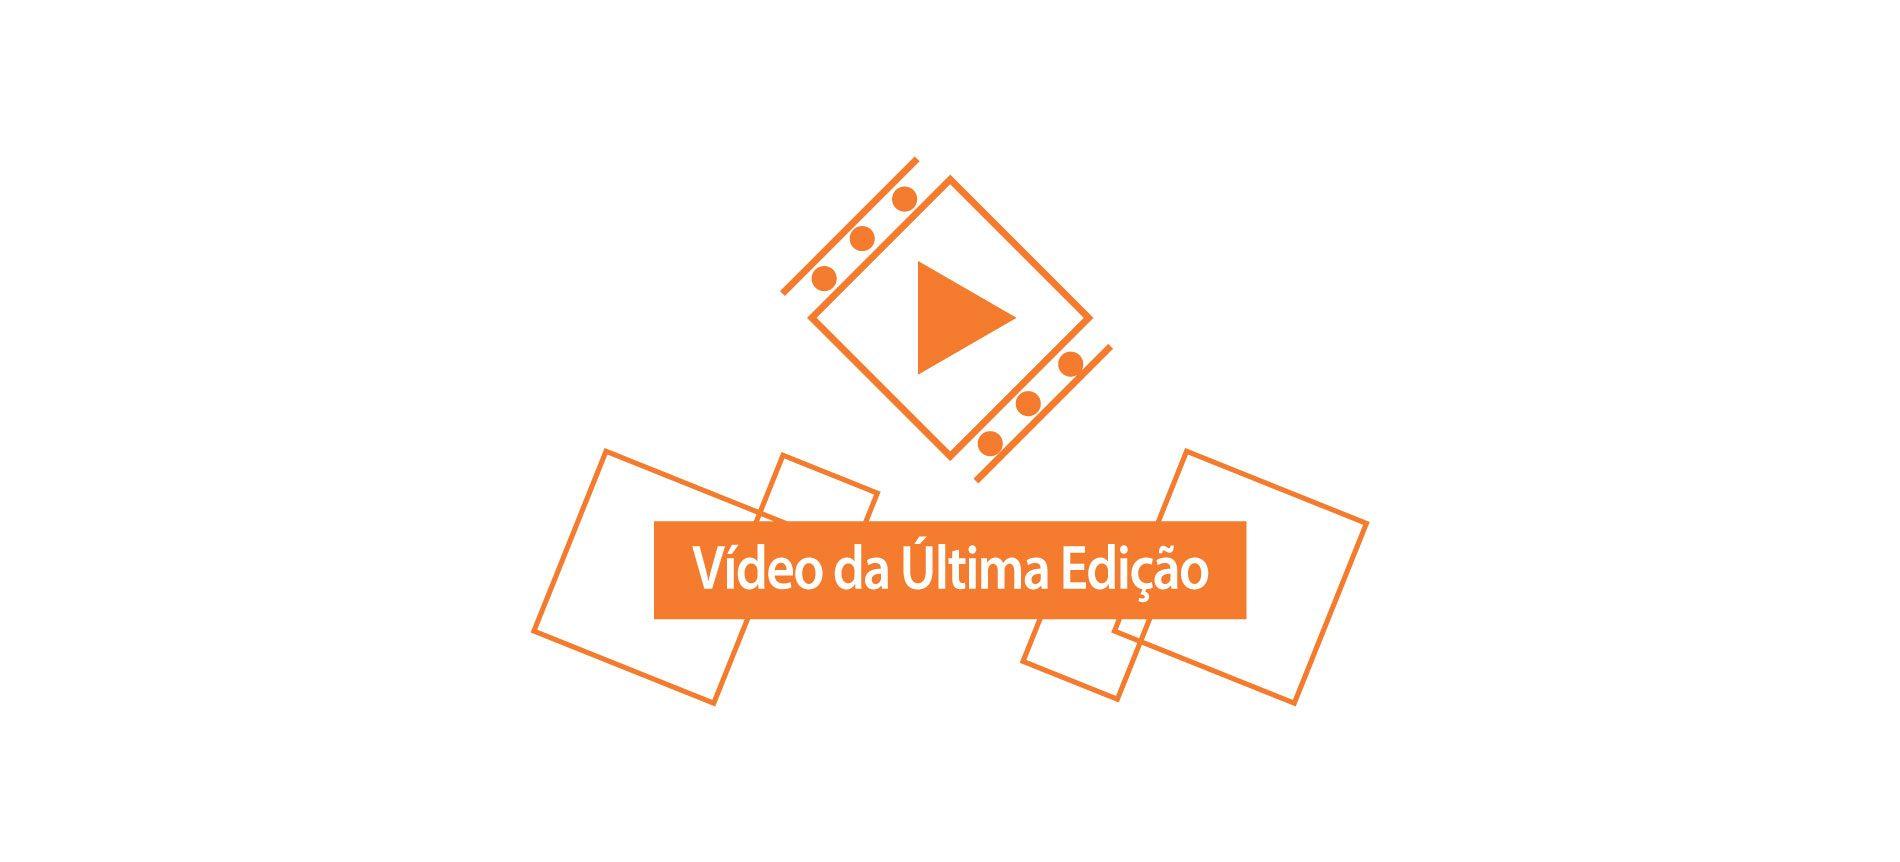 https://www.mestregp.com.br/wp-content/uploads/2018/03/Pagina-EGPMP-pt5-1900x862.jpg